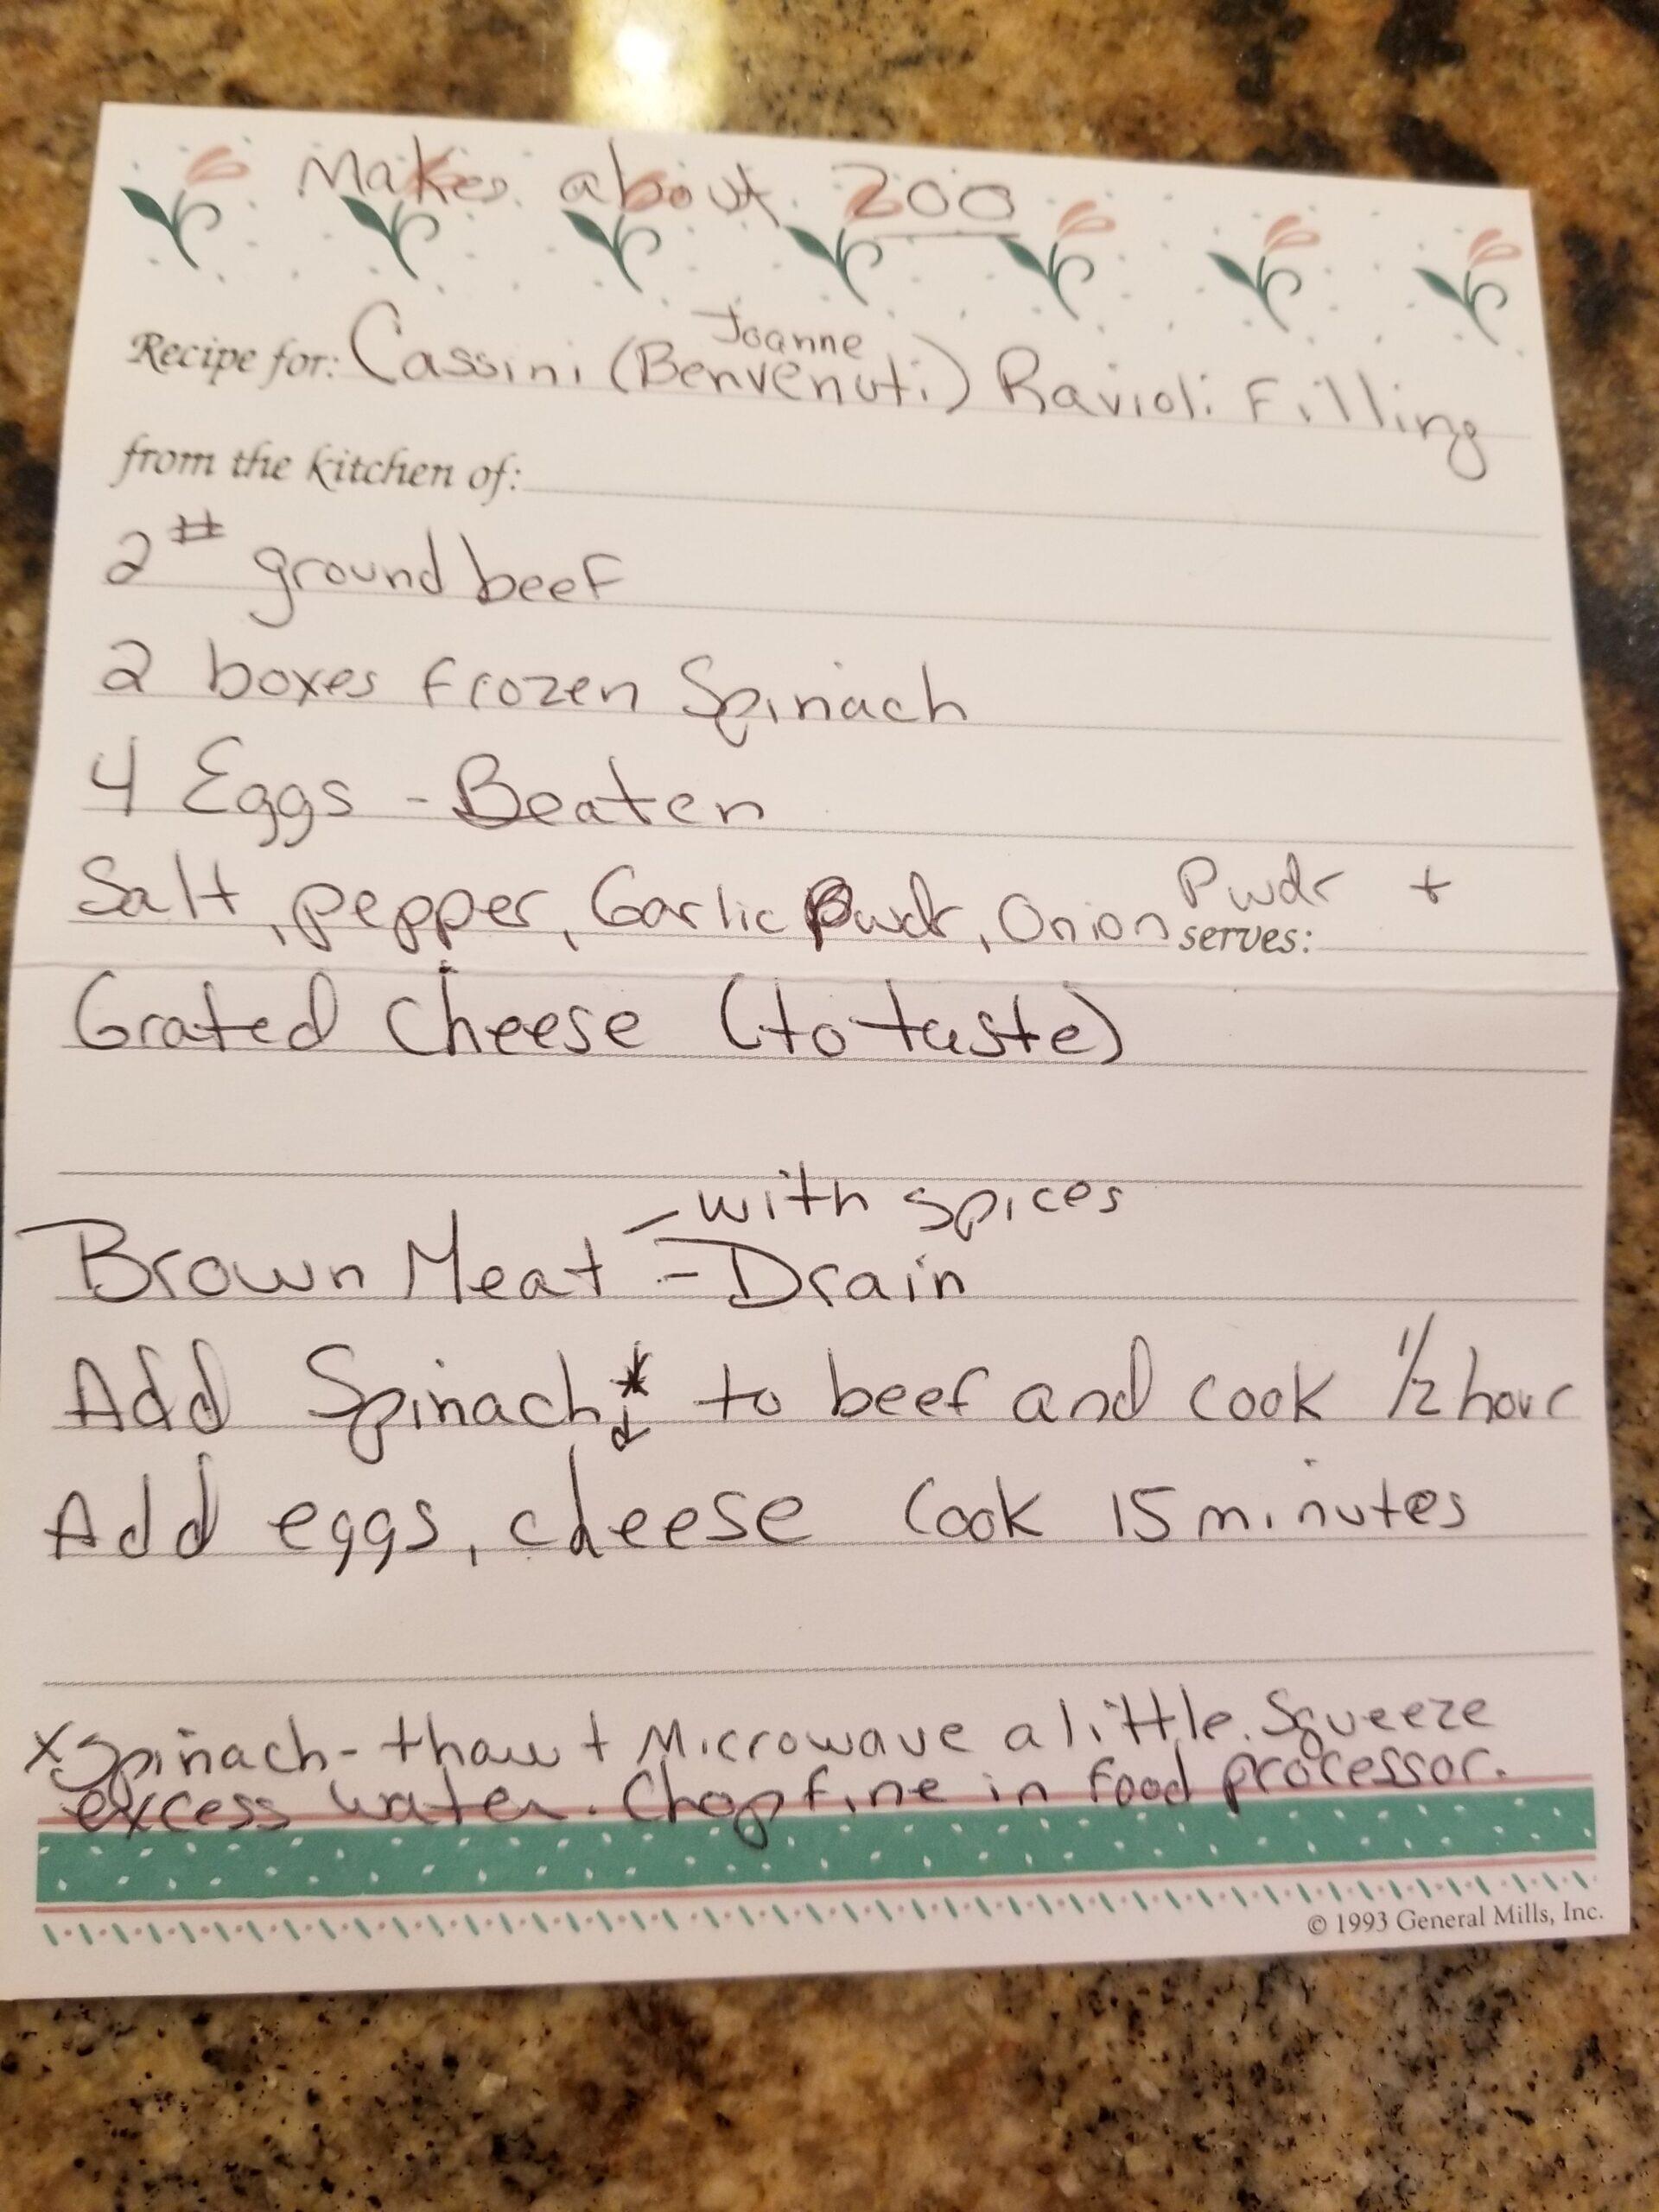 Casani filling recipe